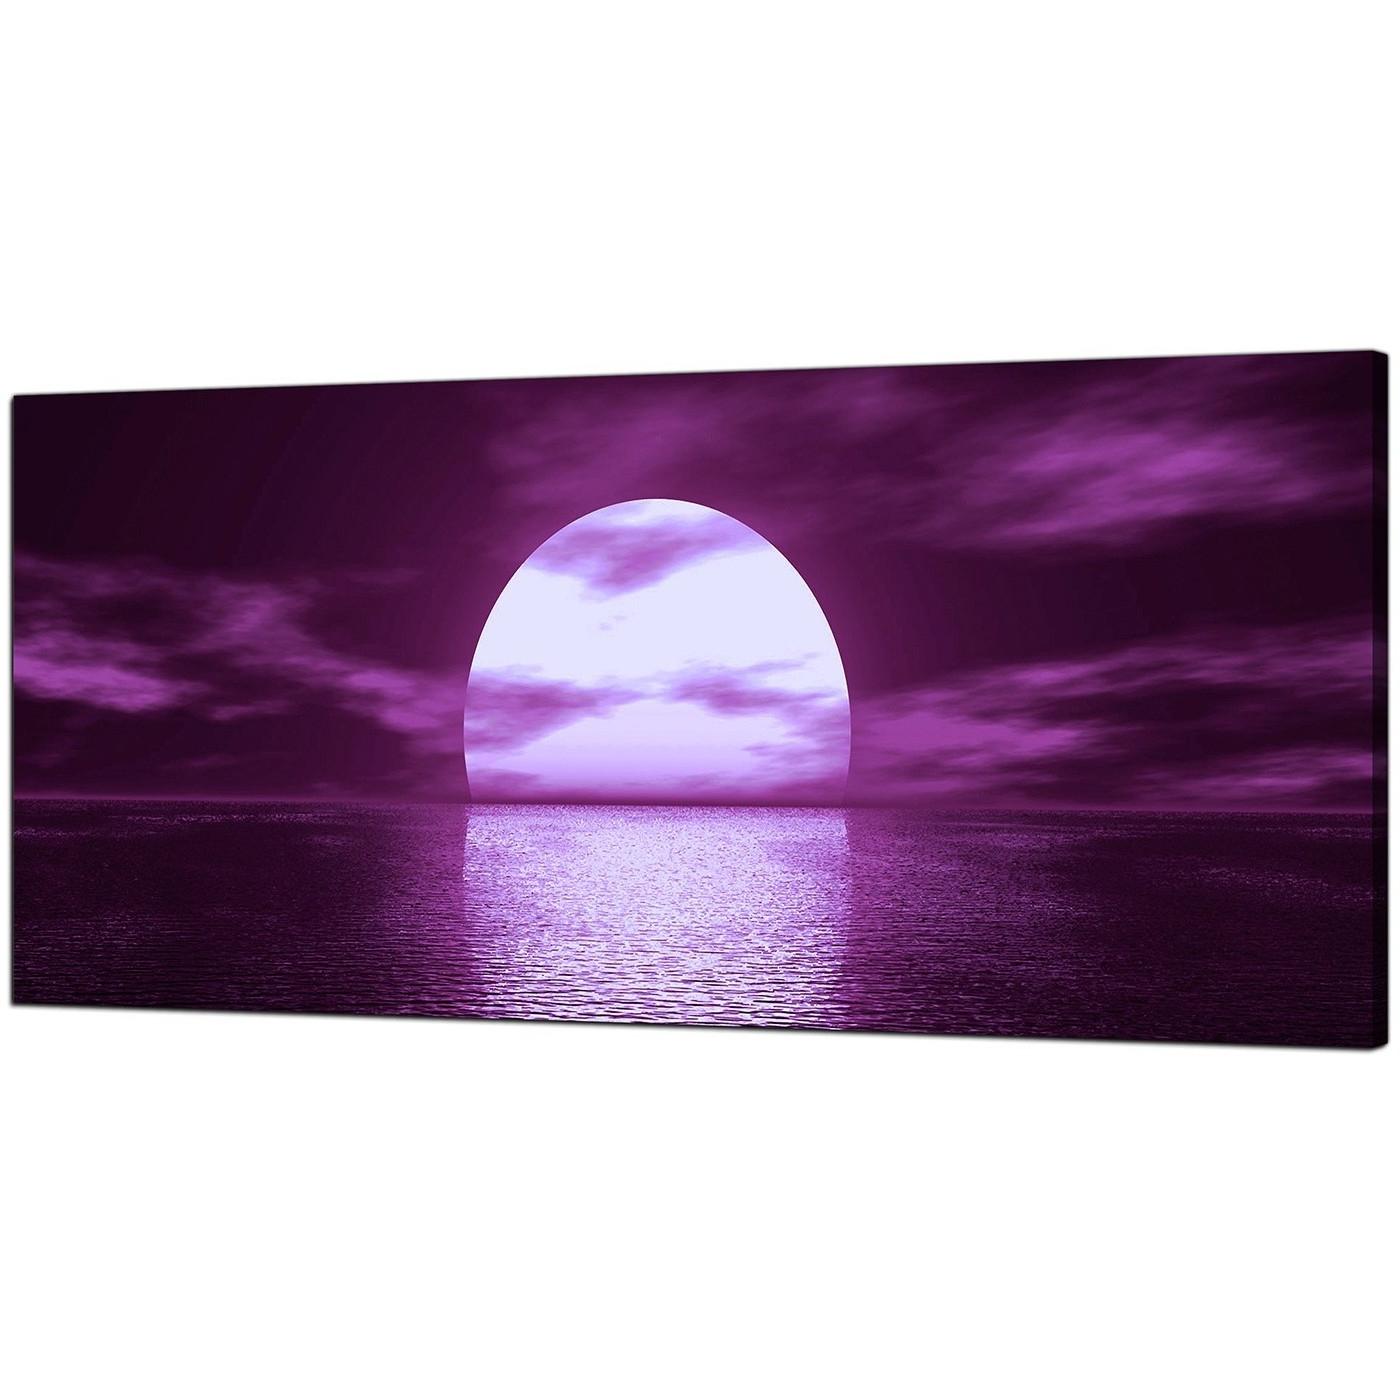 Newest Purple Wall Art Regarding Large Purple Canvas Art Of A Sea Sunset (View 3 of 15)